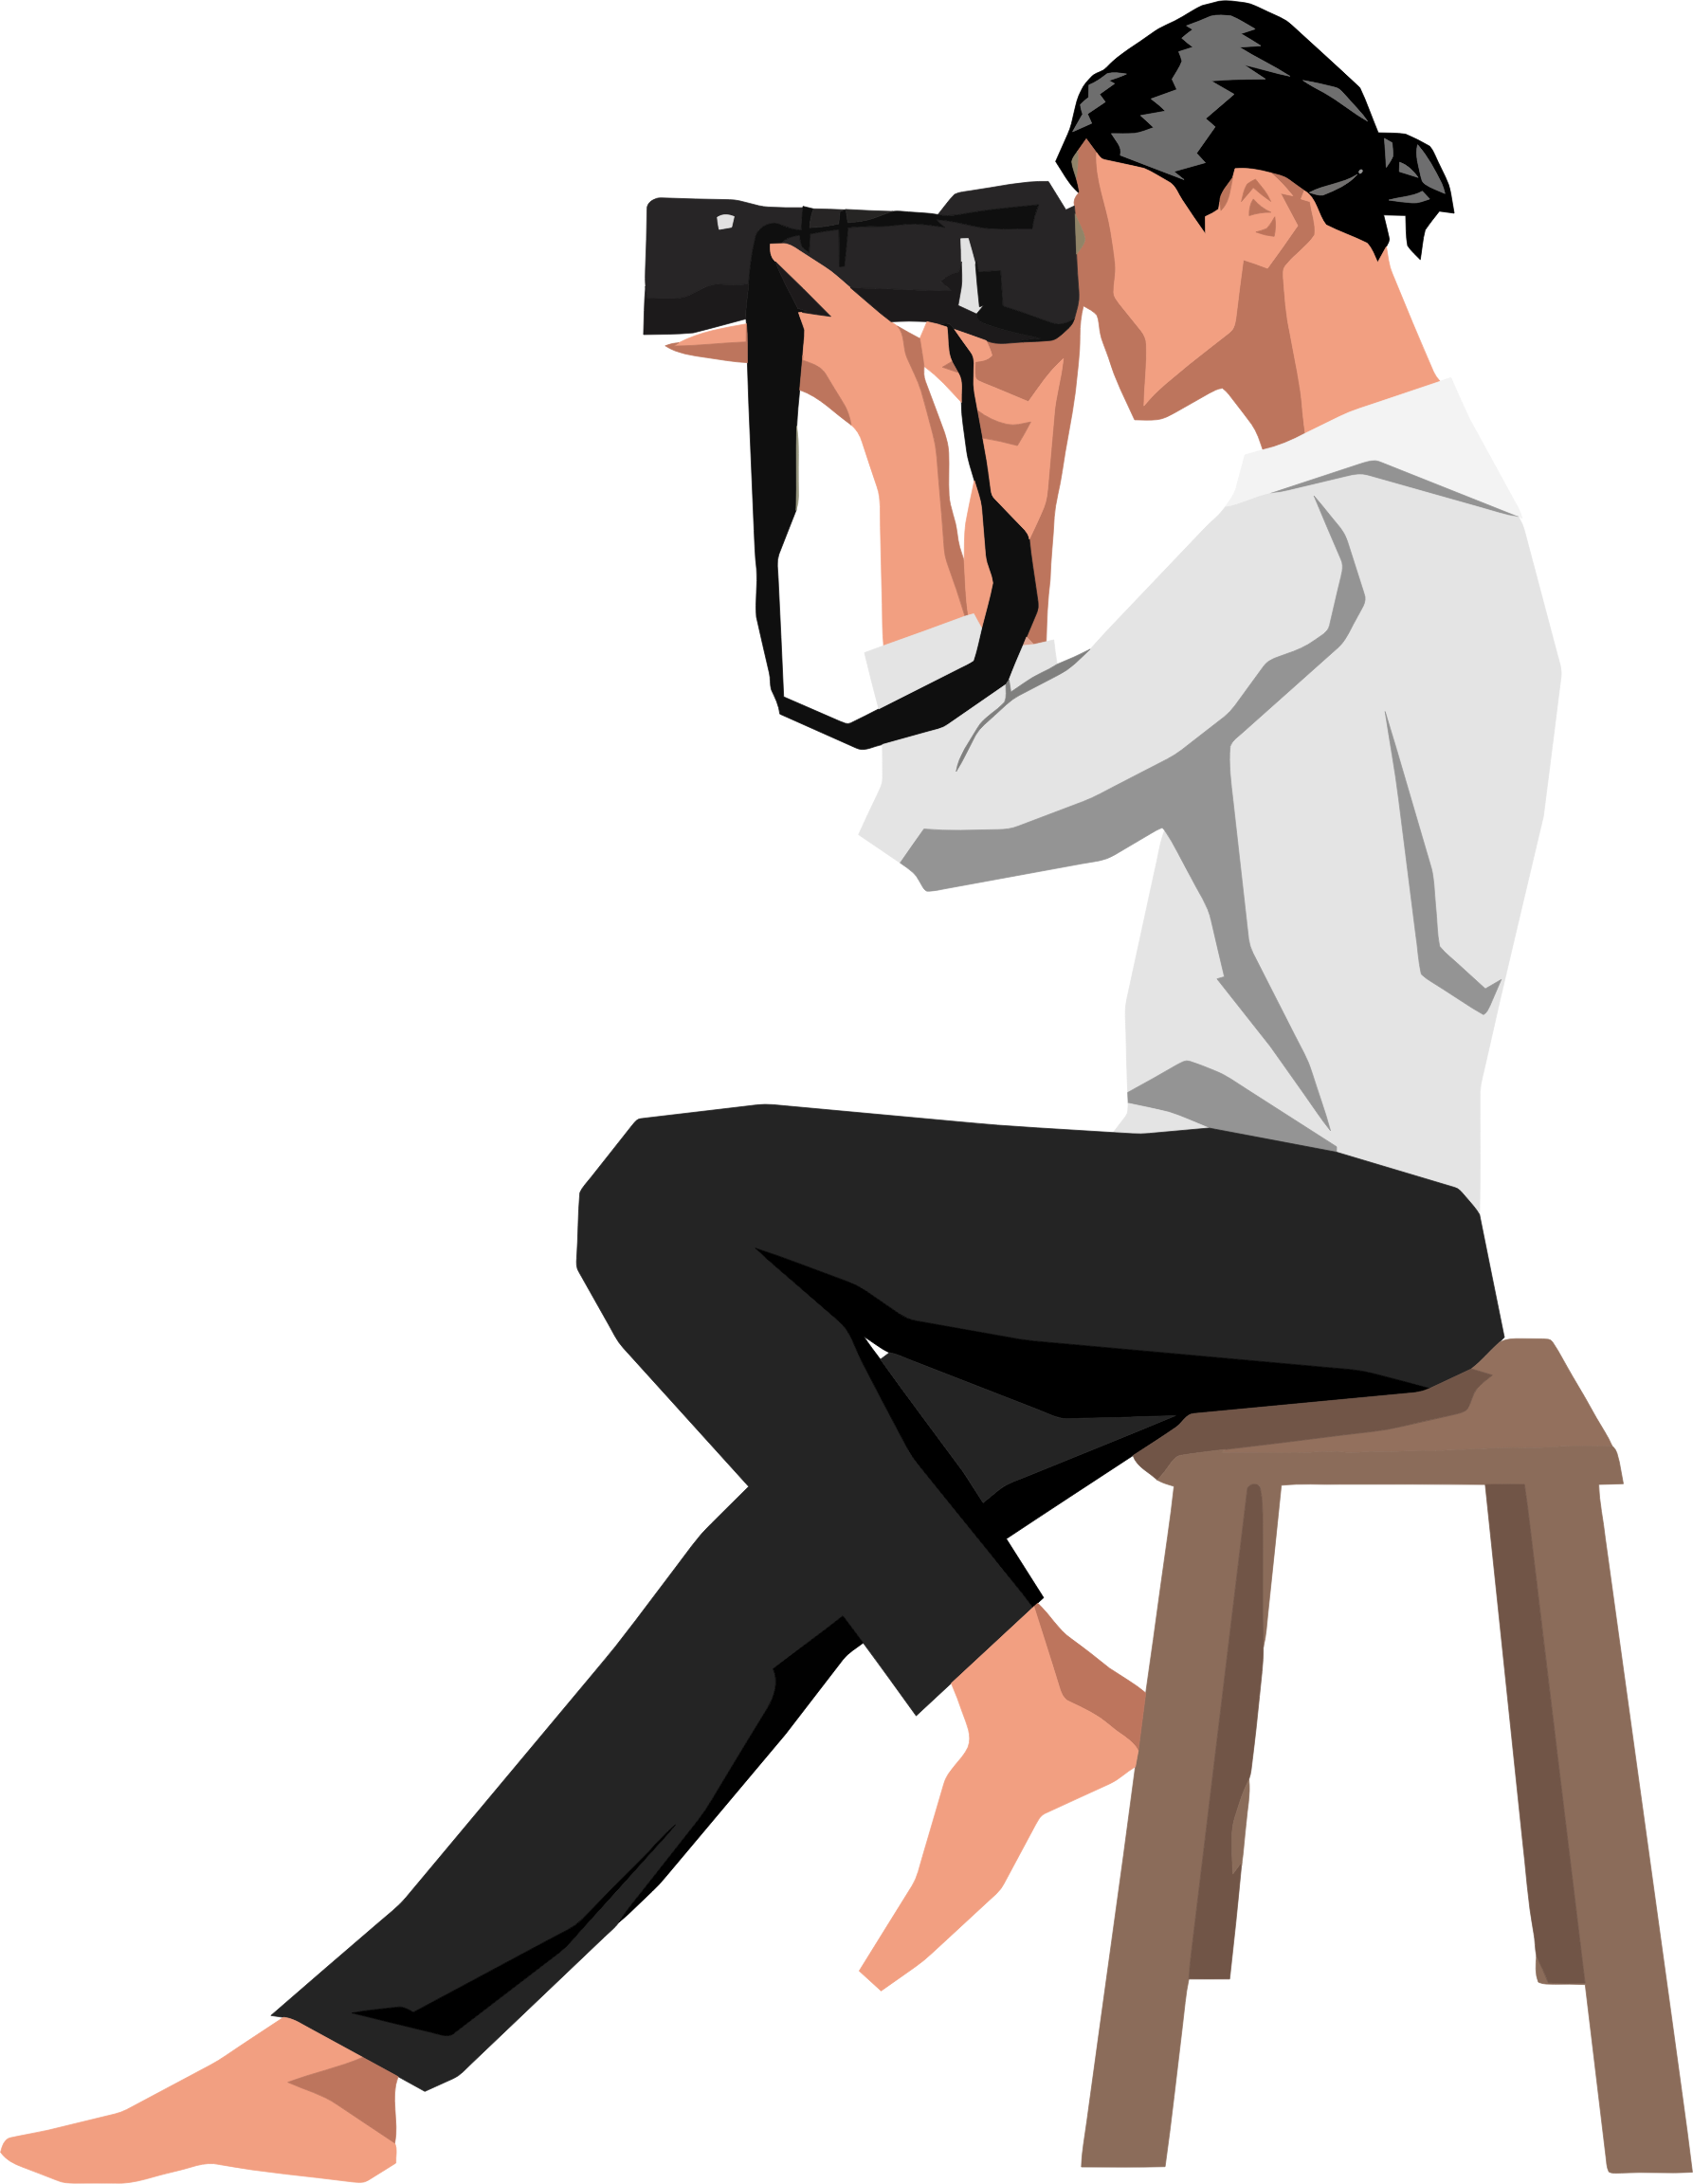 Clipart gun person. Woman photographer on stool